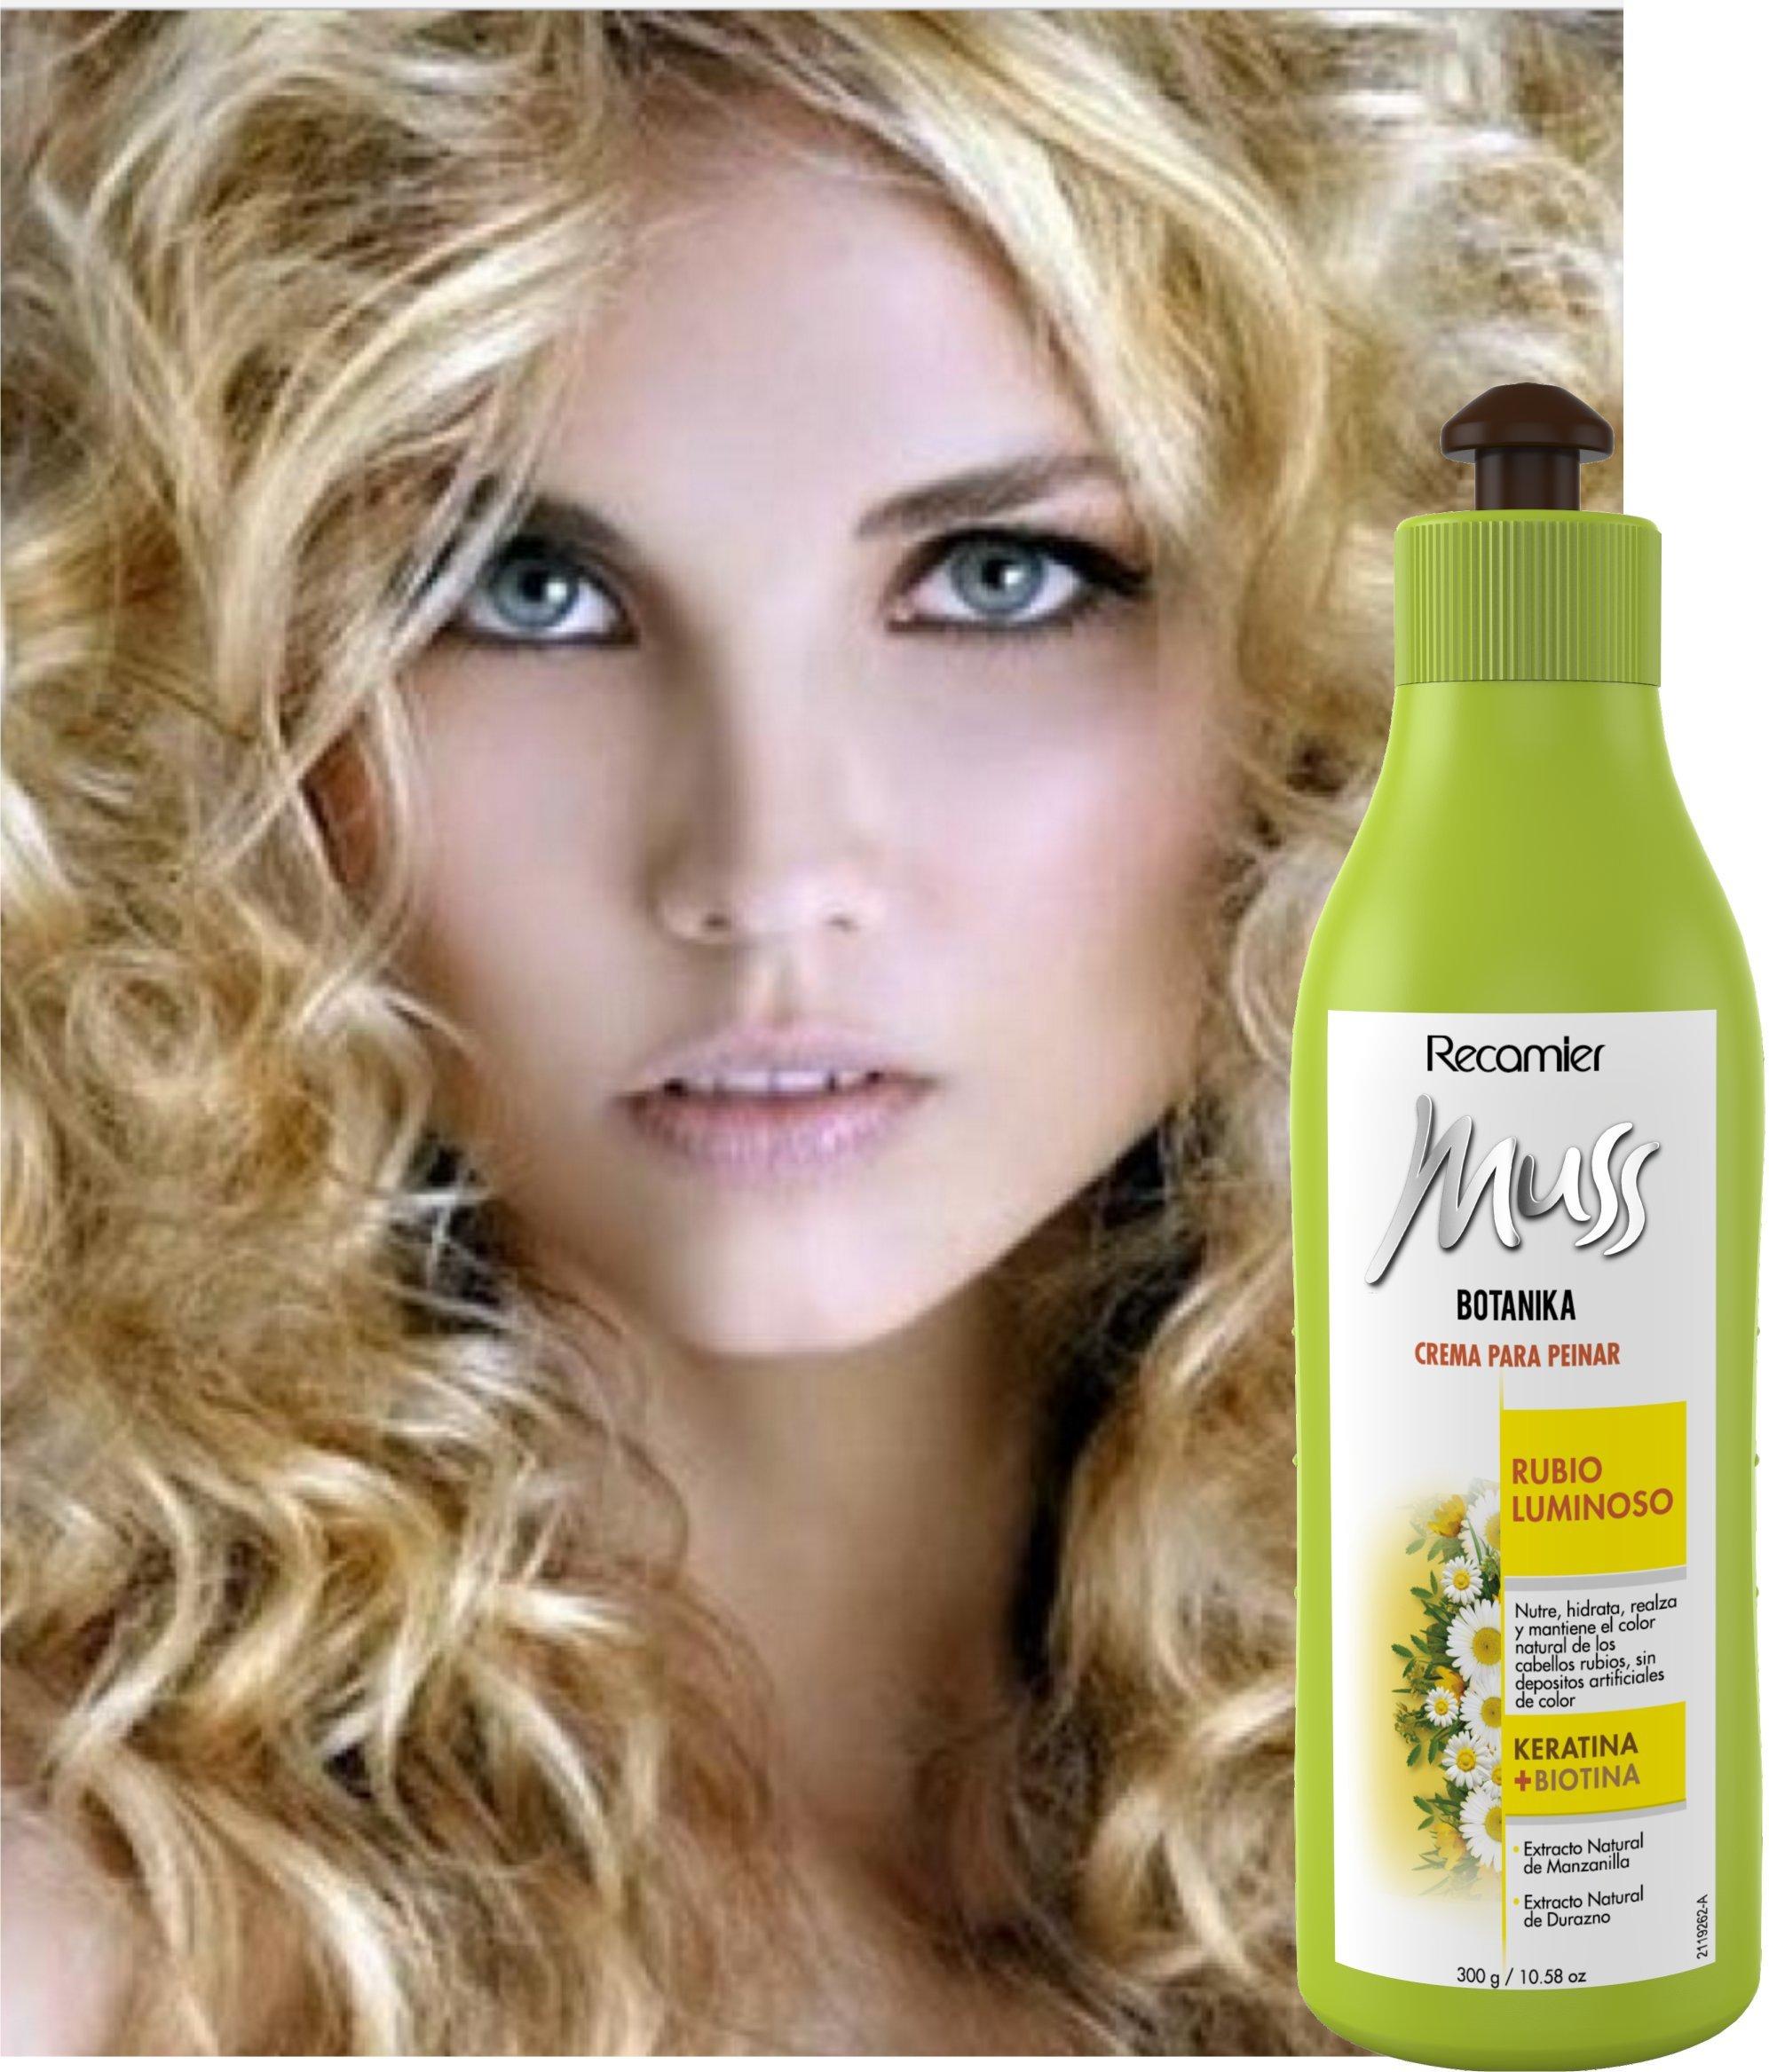 Hair Brightener: Customer Reviews. Which hair clarifier is better 46